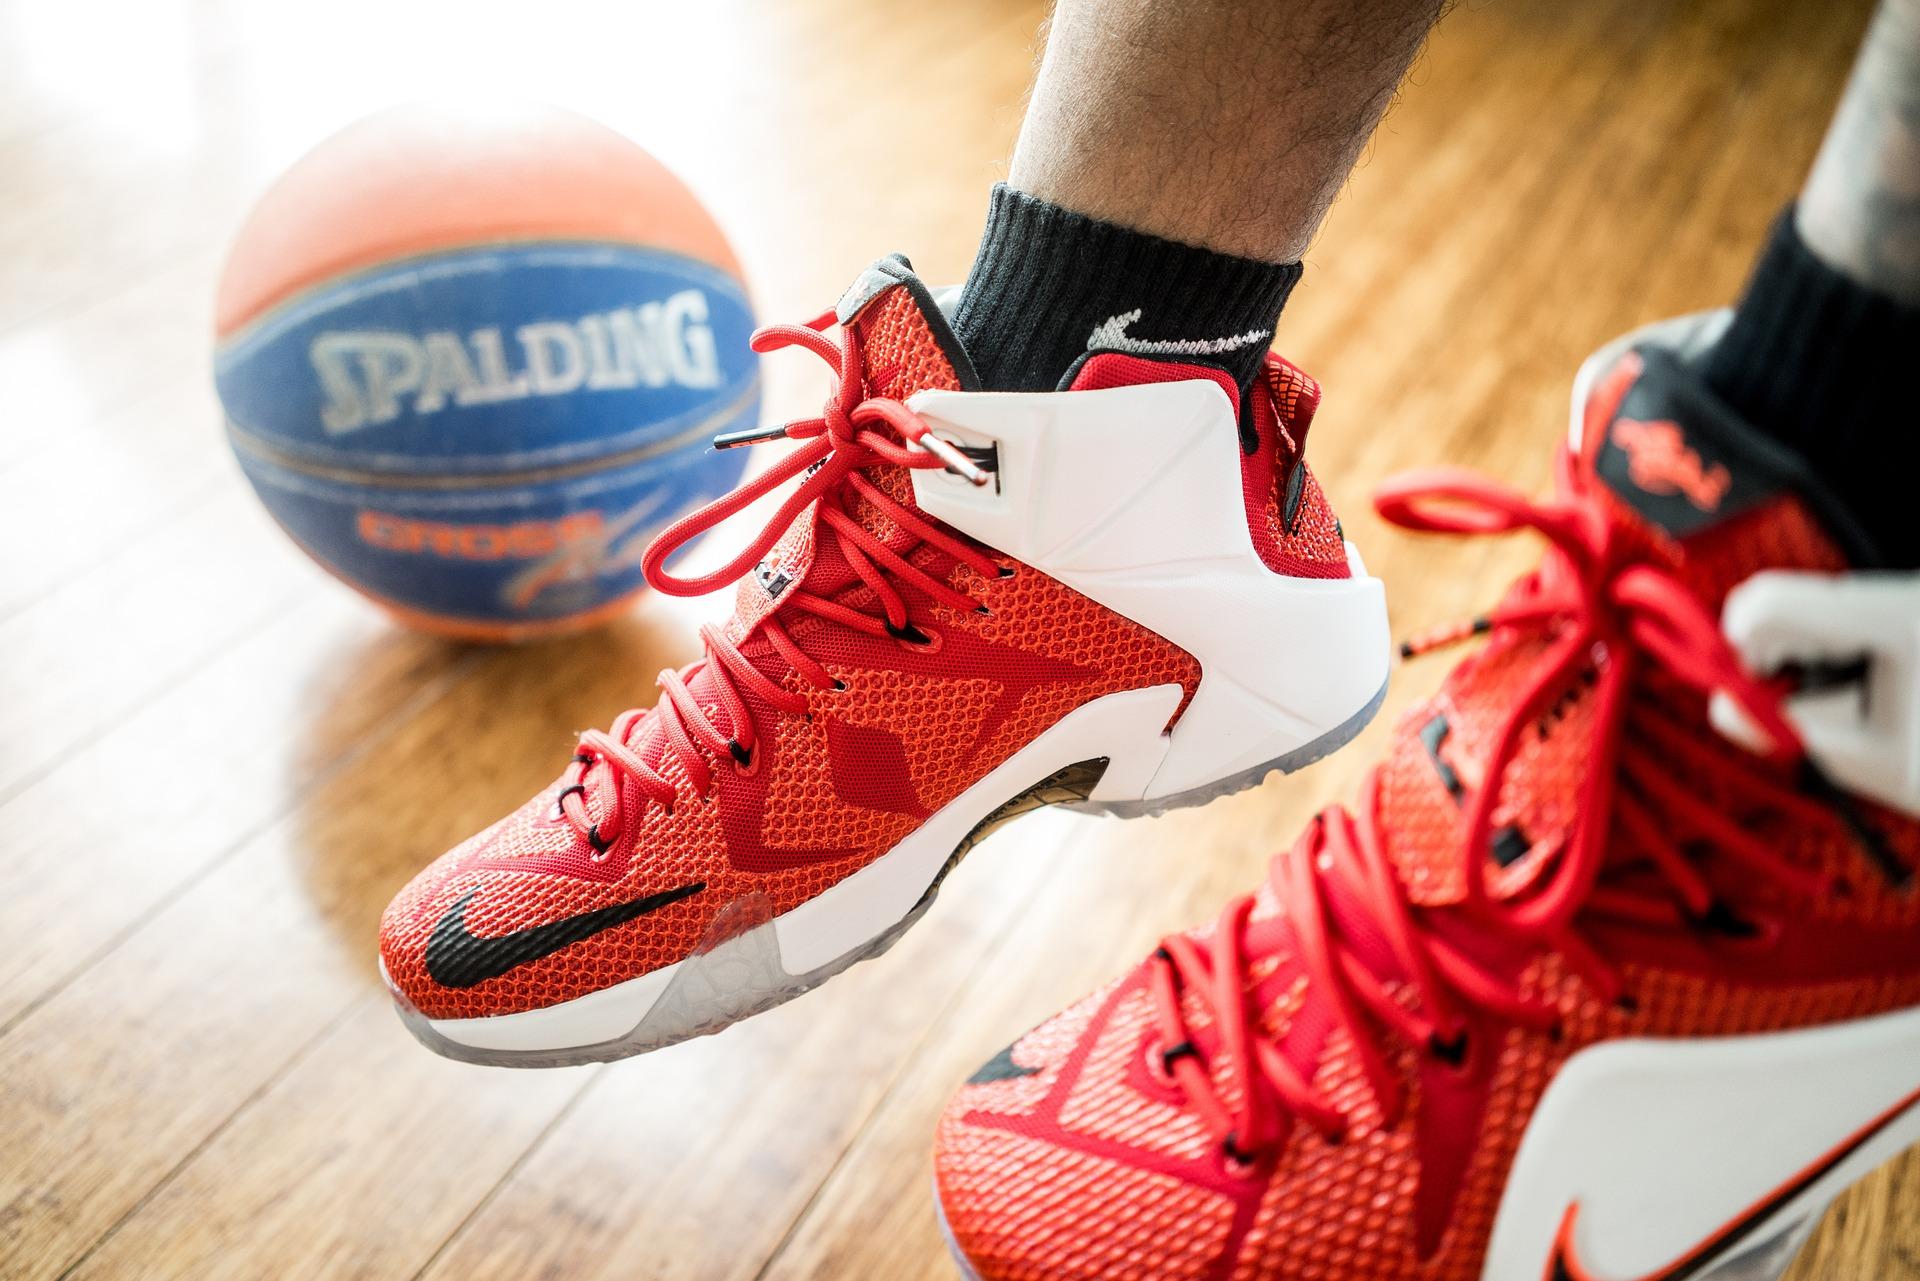 basket-ball-shoes